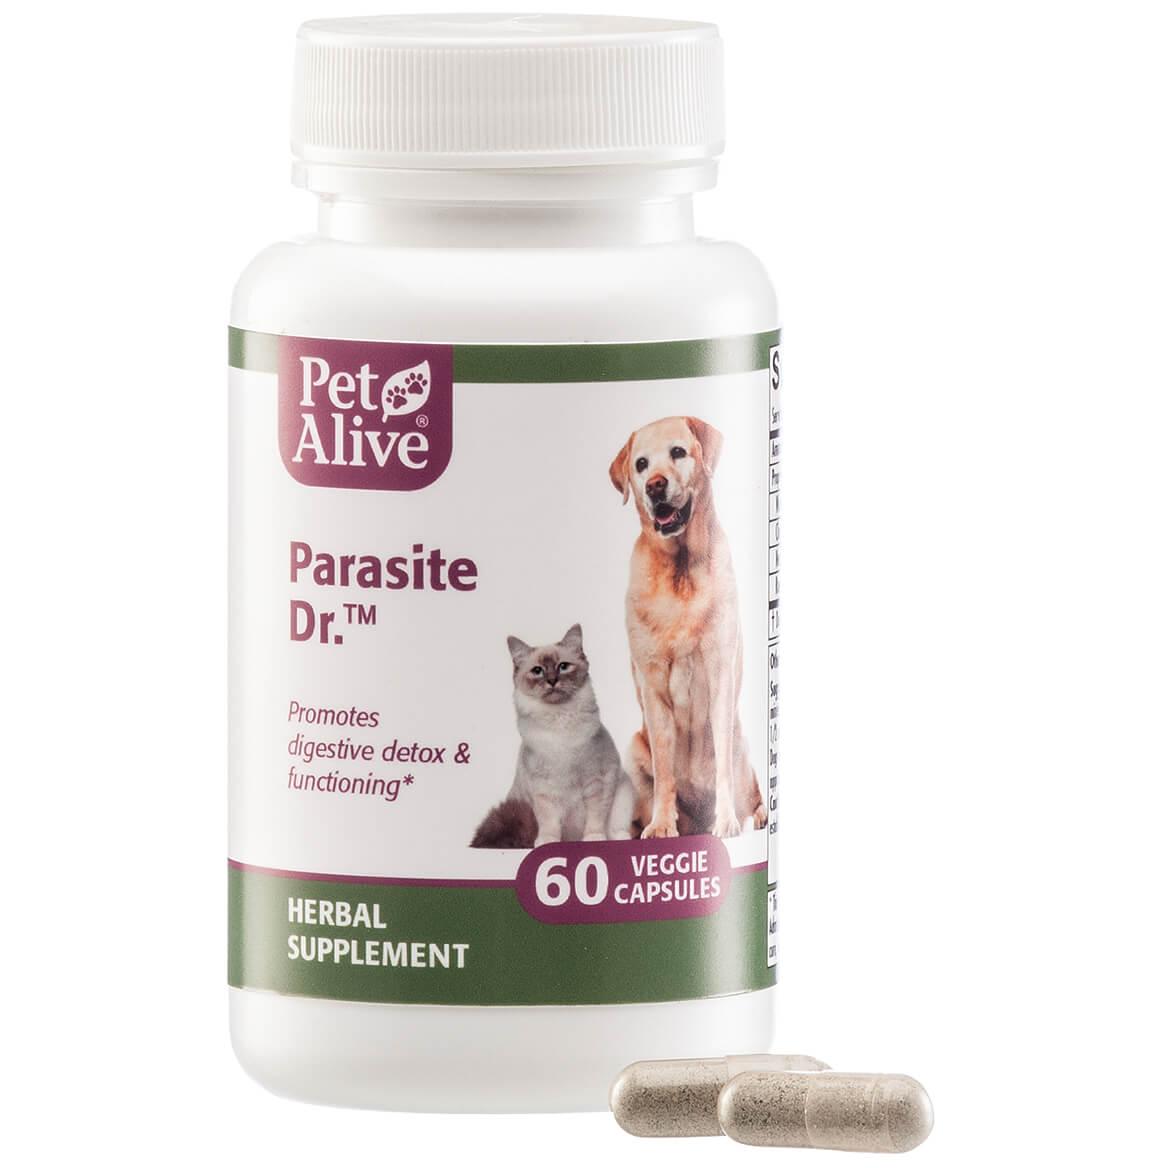 Parasite Dr.™ for Cat & Dog Digestive Detoxification-351861